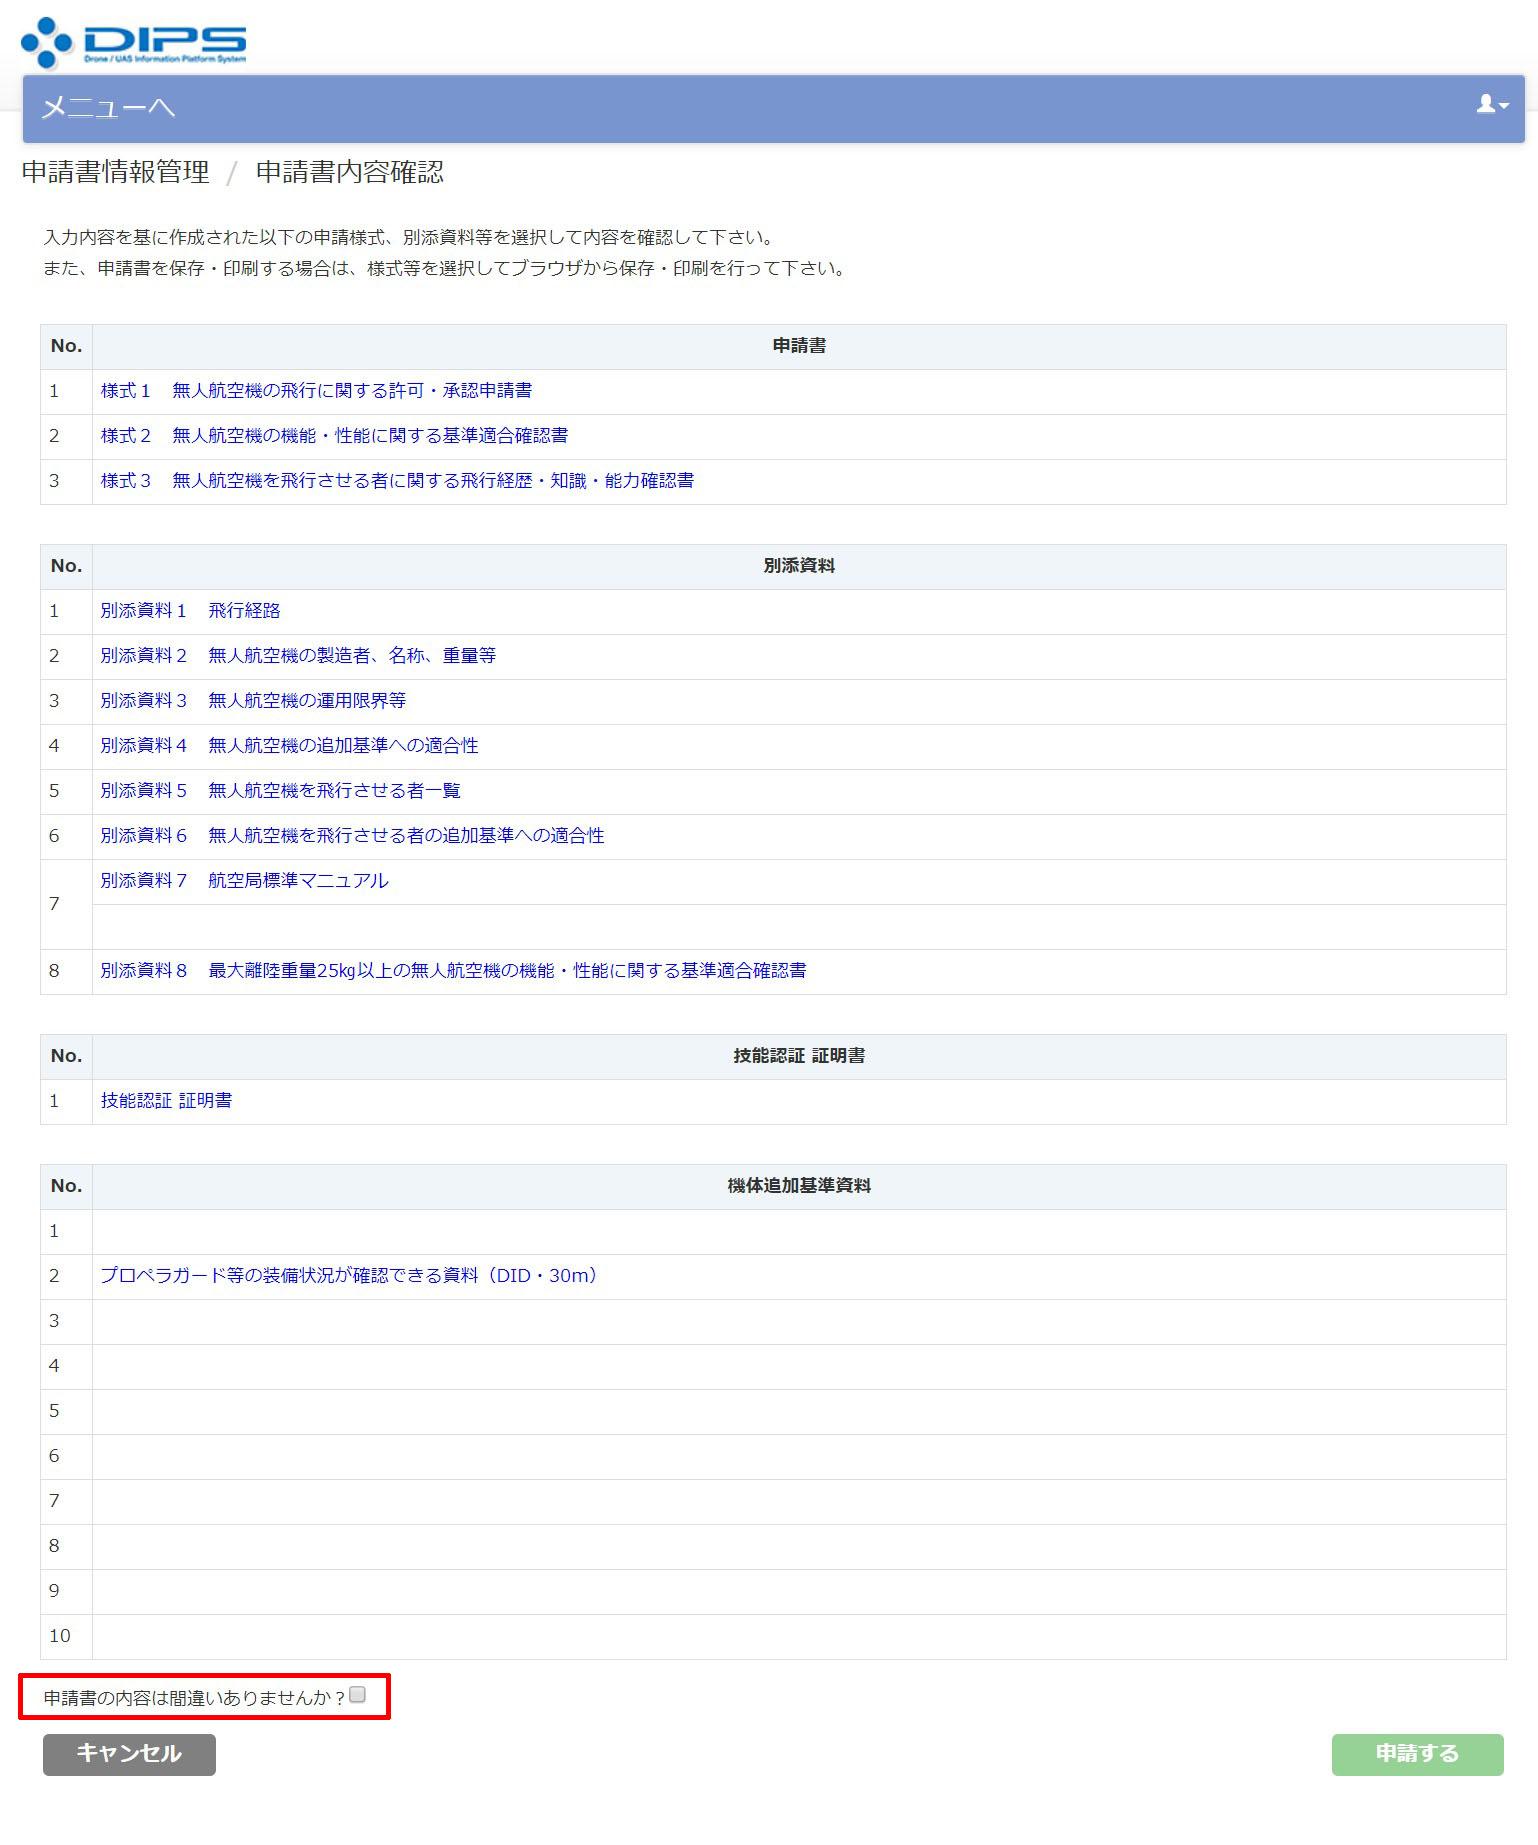 dips申請書情報管理